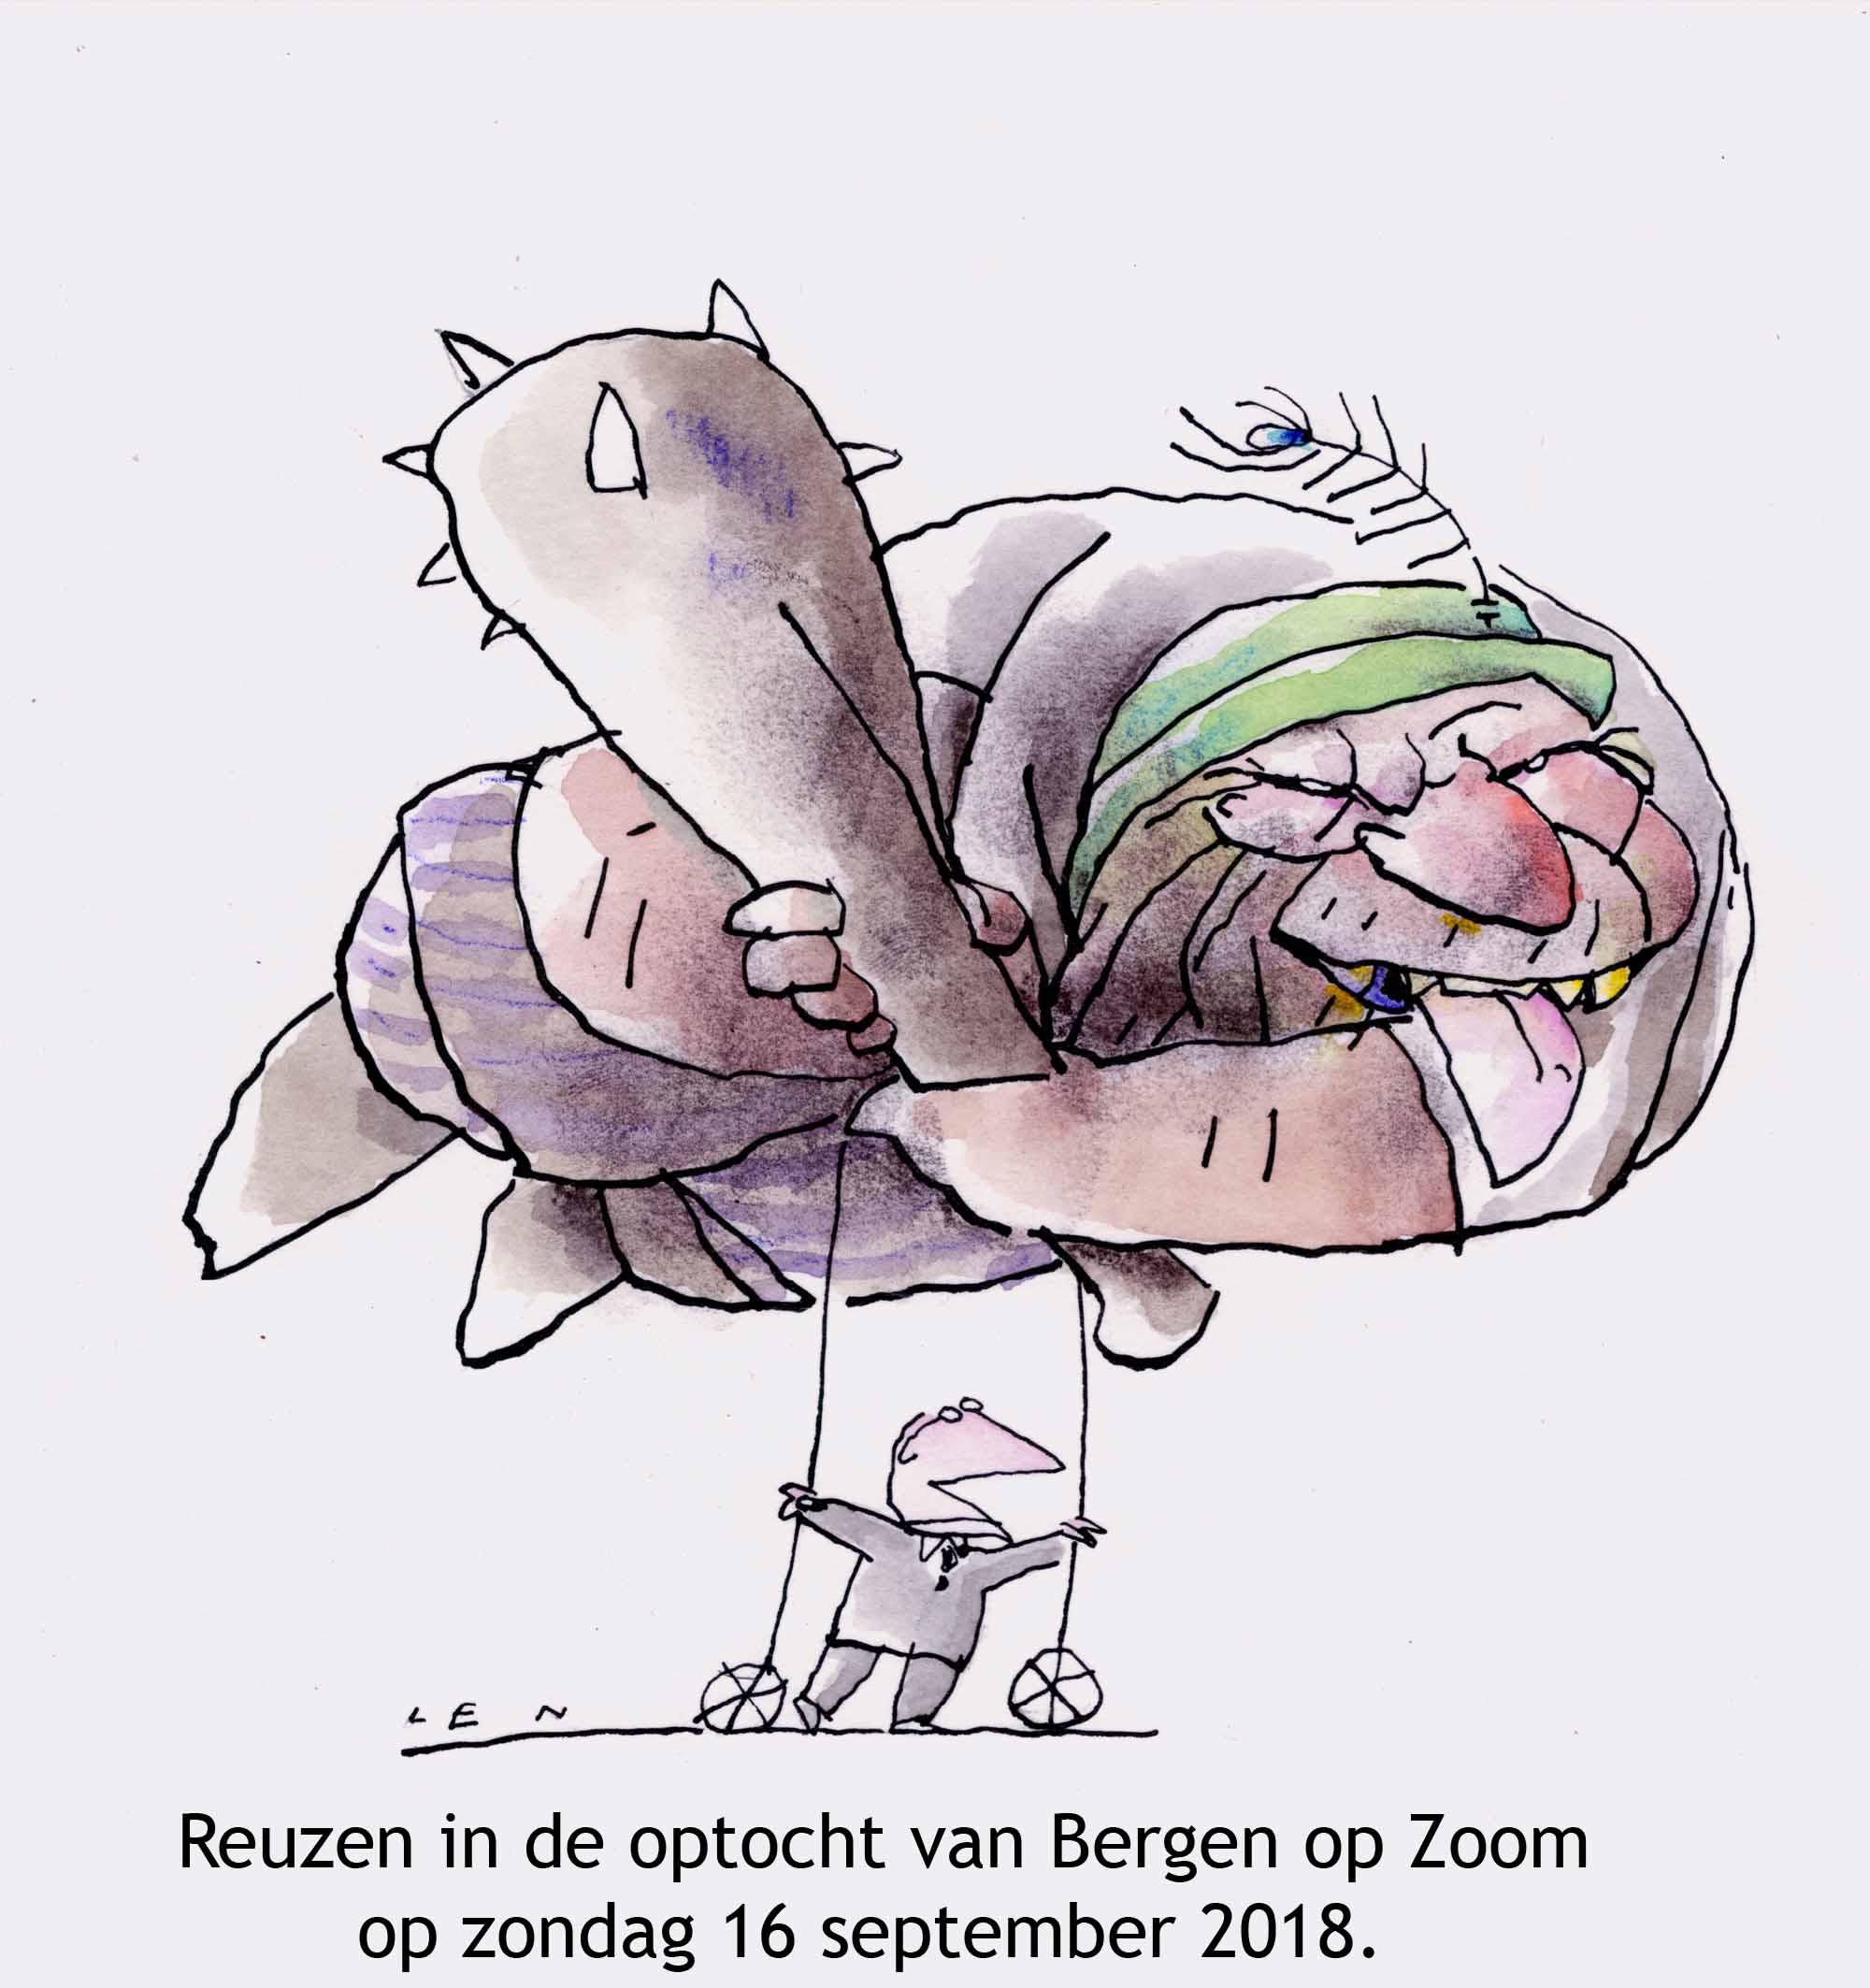 bc201804-len_munnik-cartoon_juli_2018-met-tekst-2000-.jpg